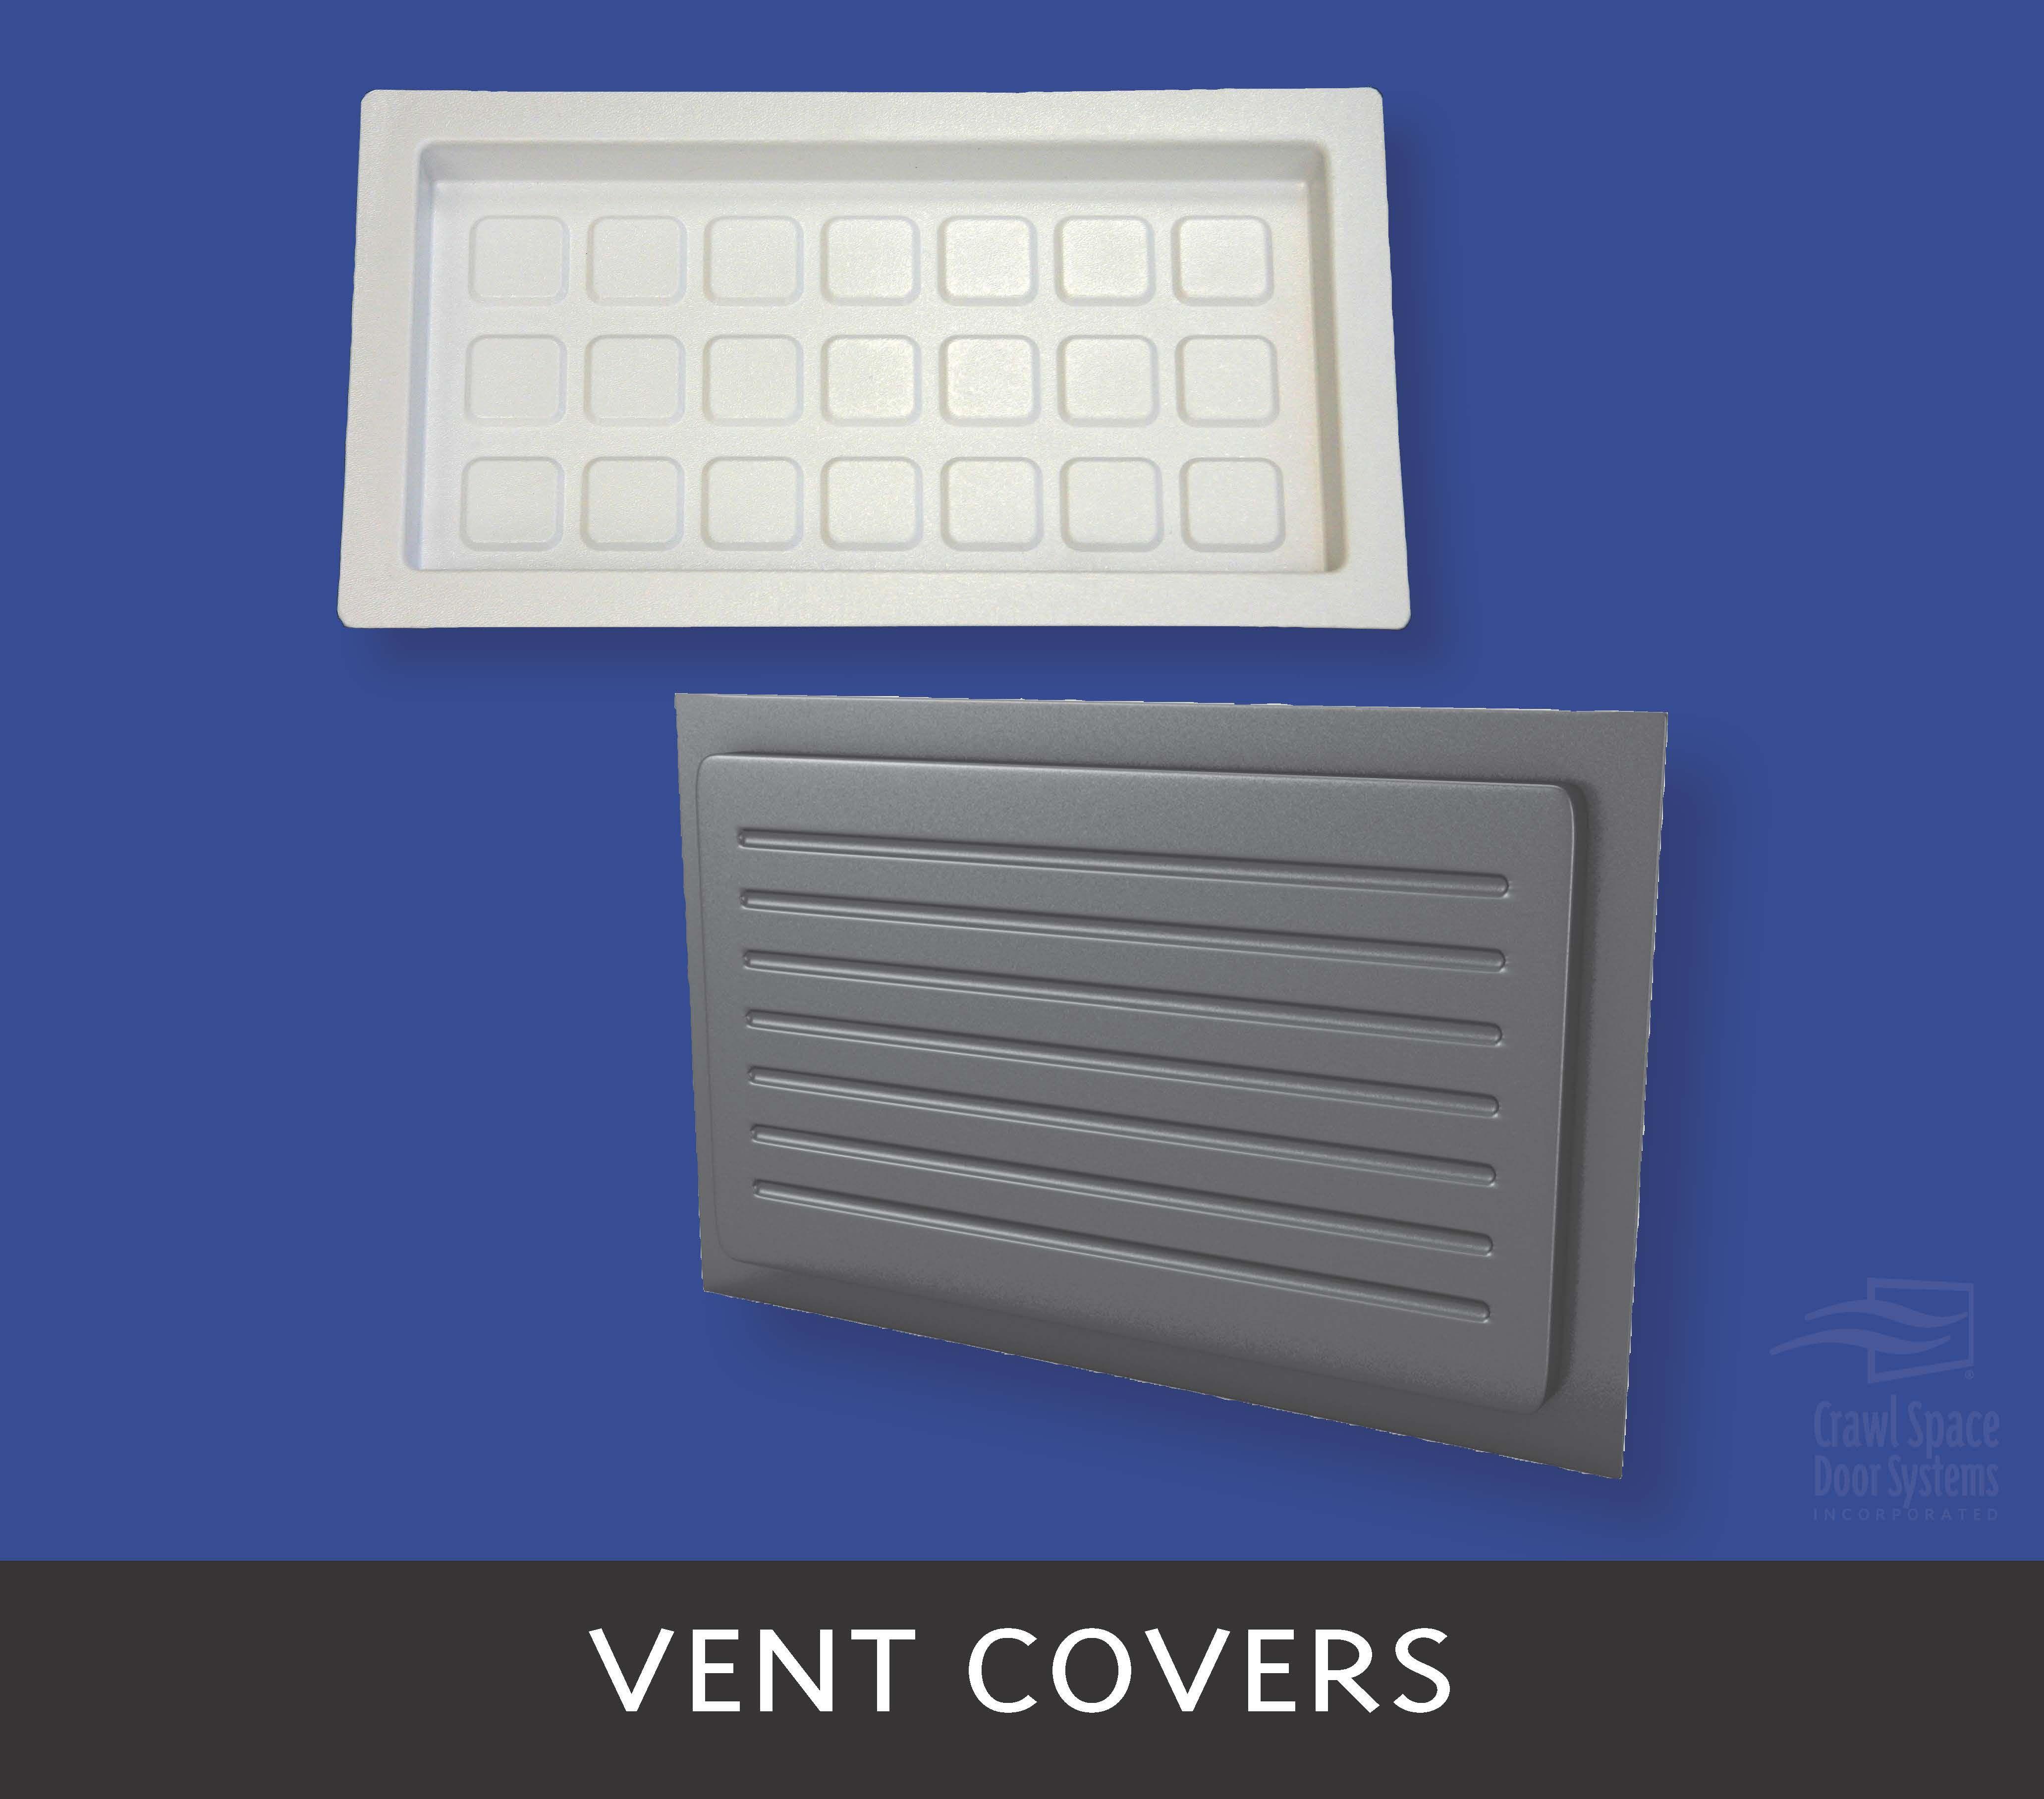 Recessed Vent Covers Crawlspace Vent Covers Crawl Space Door